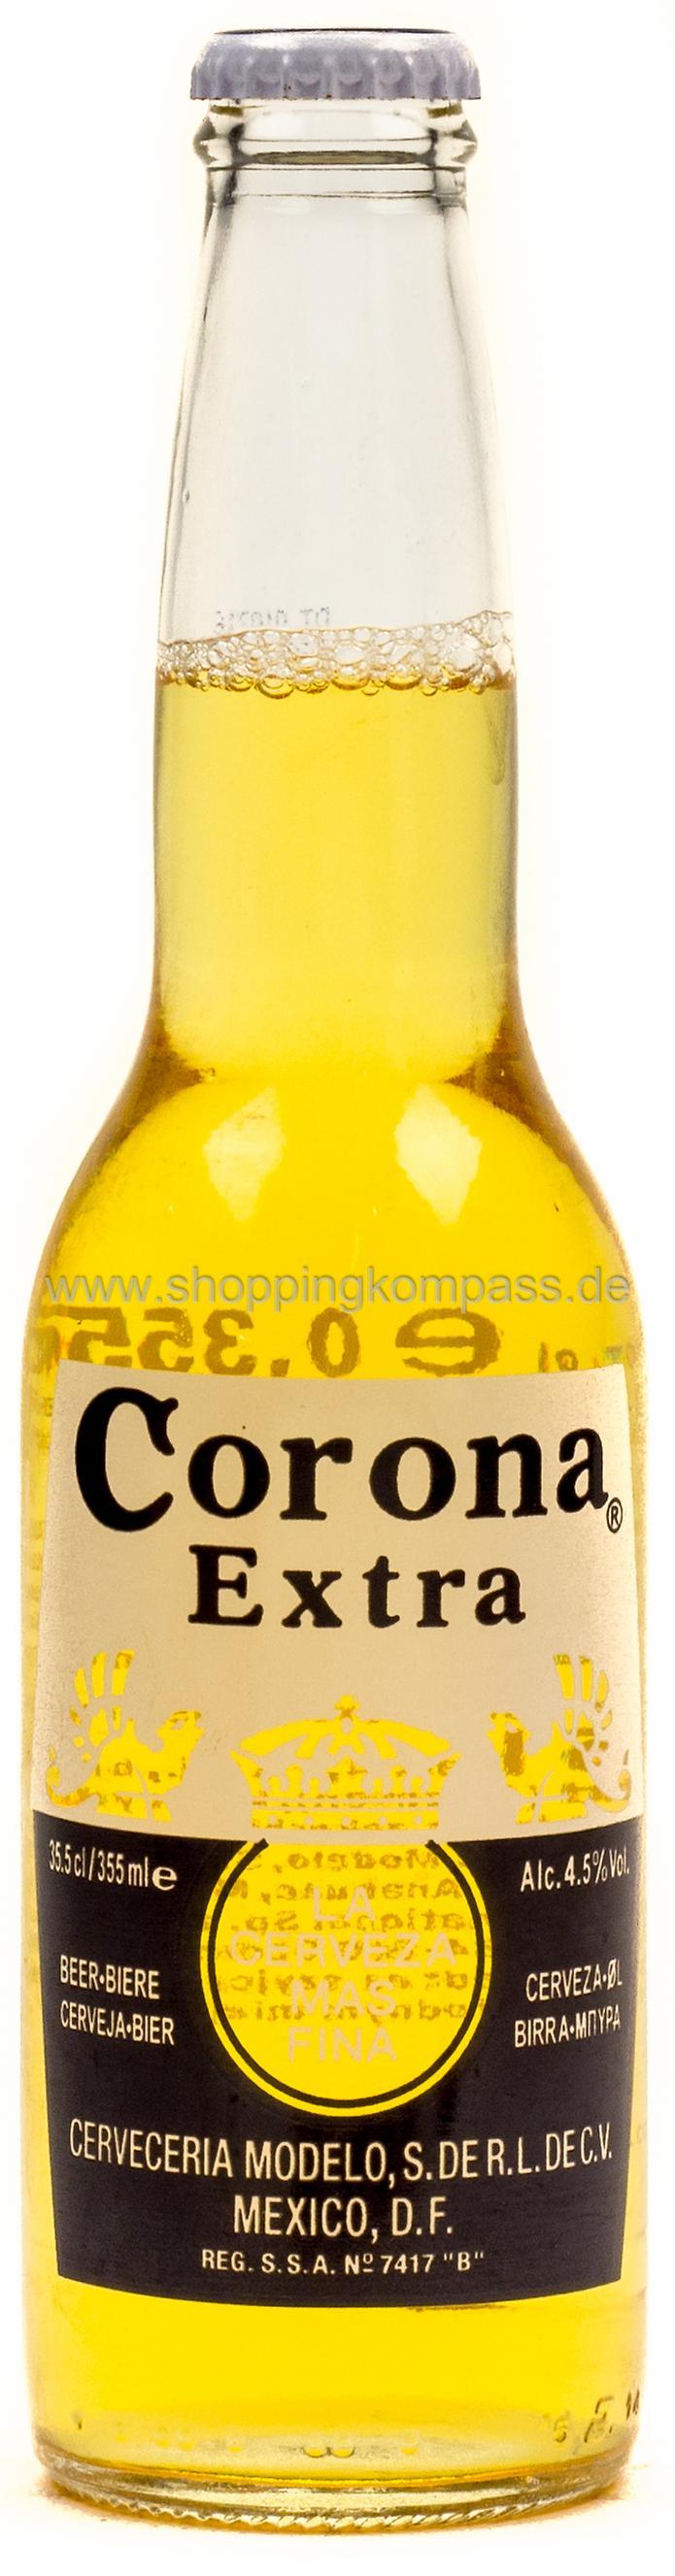 Corona Bier Bild